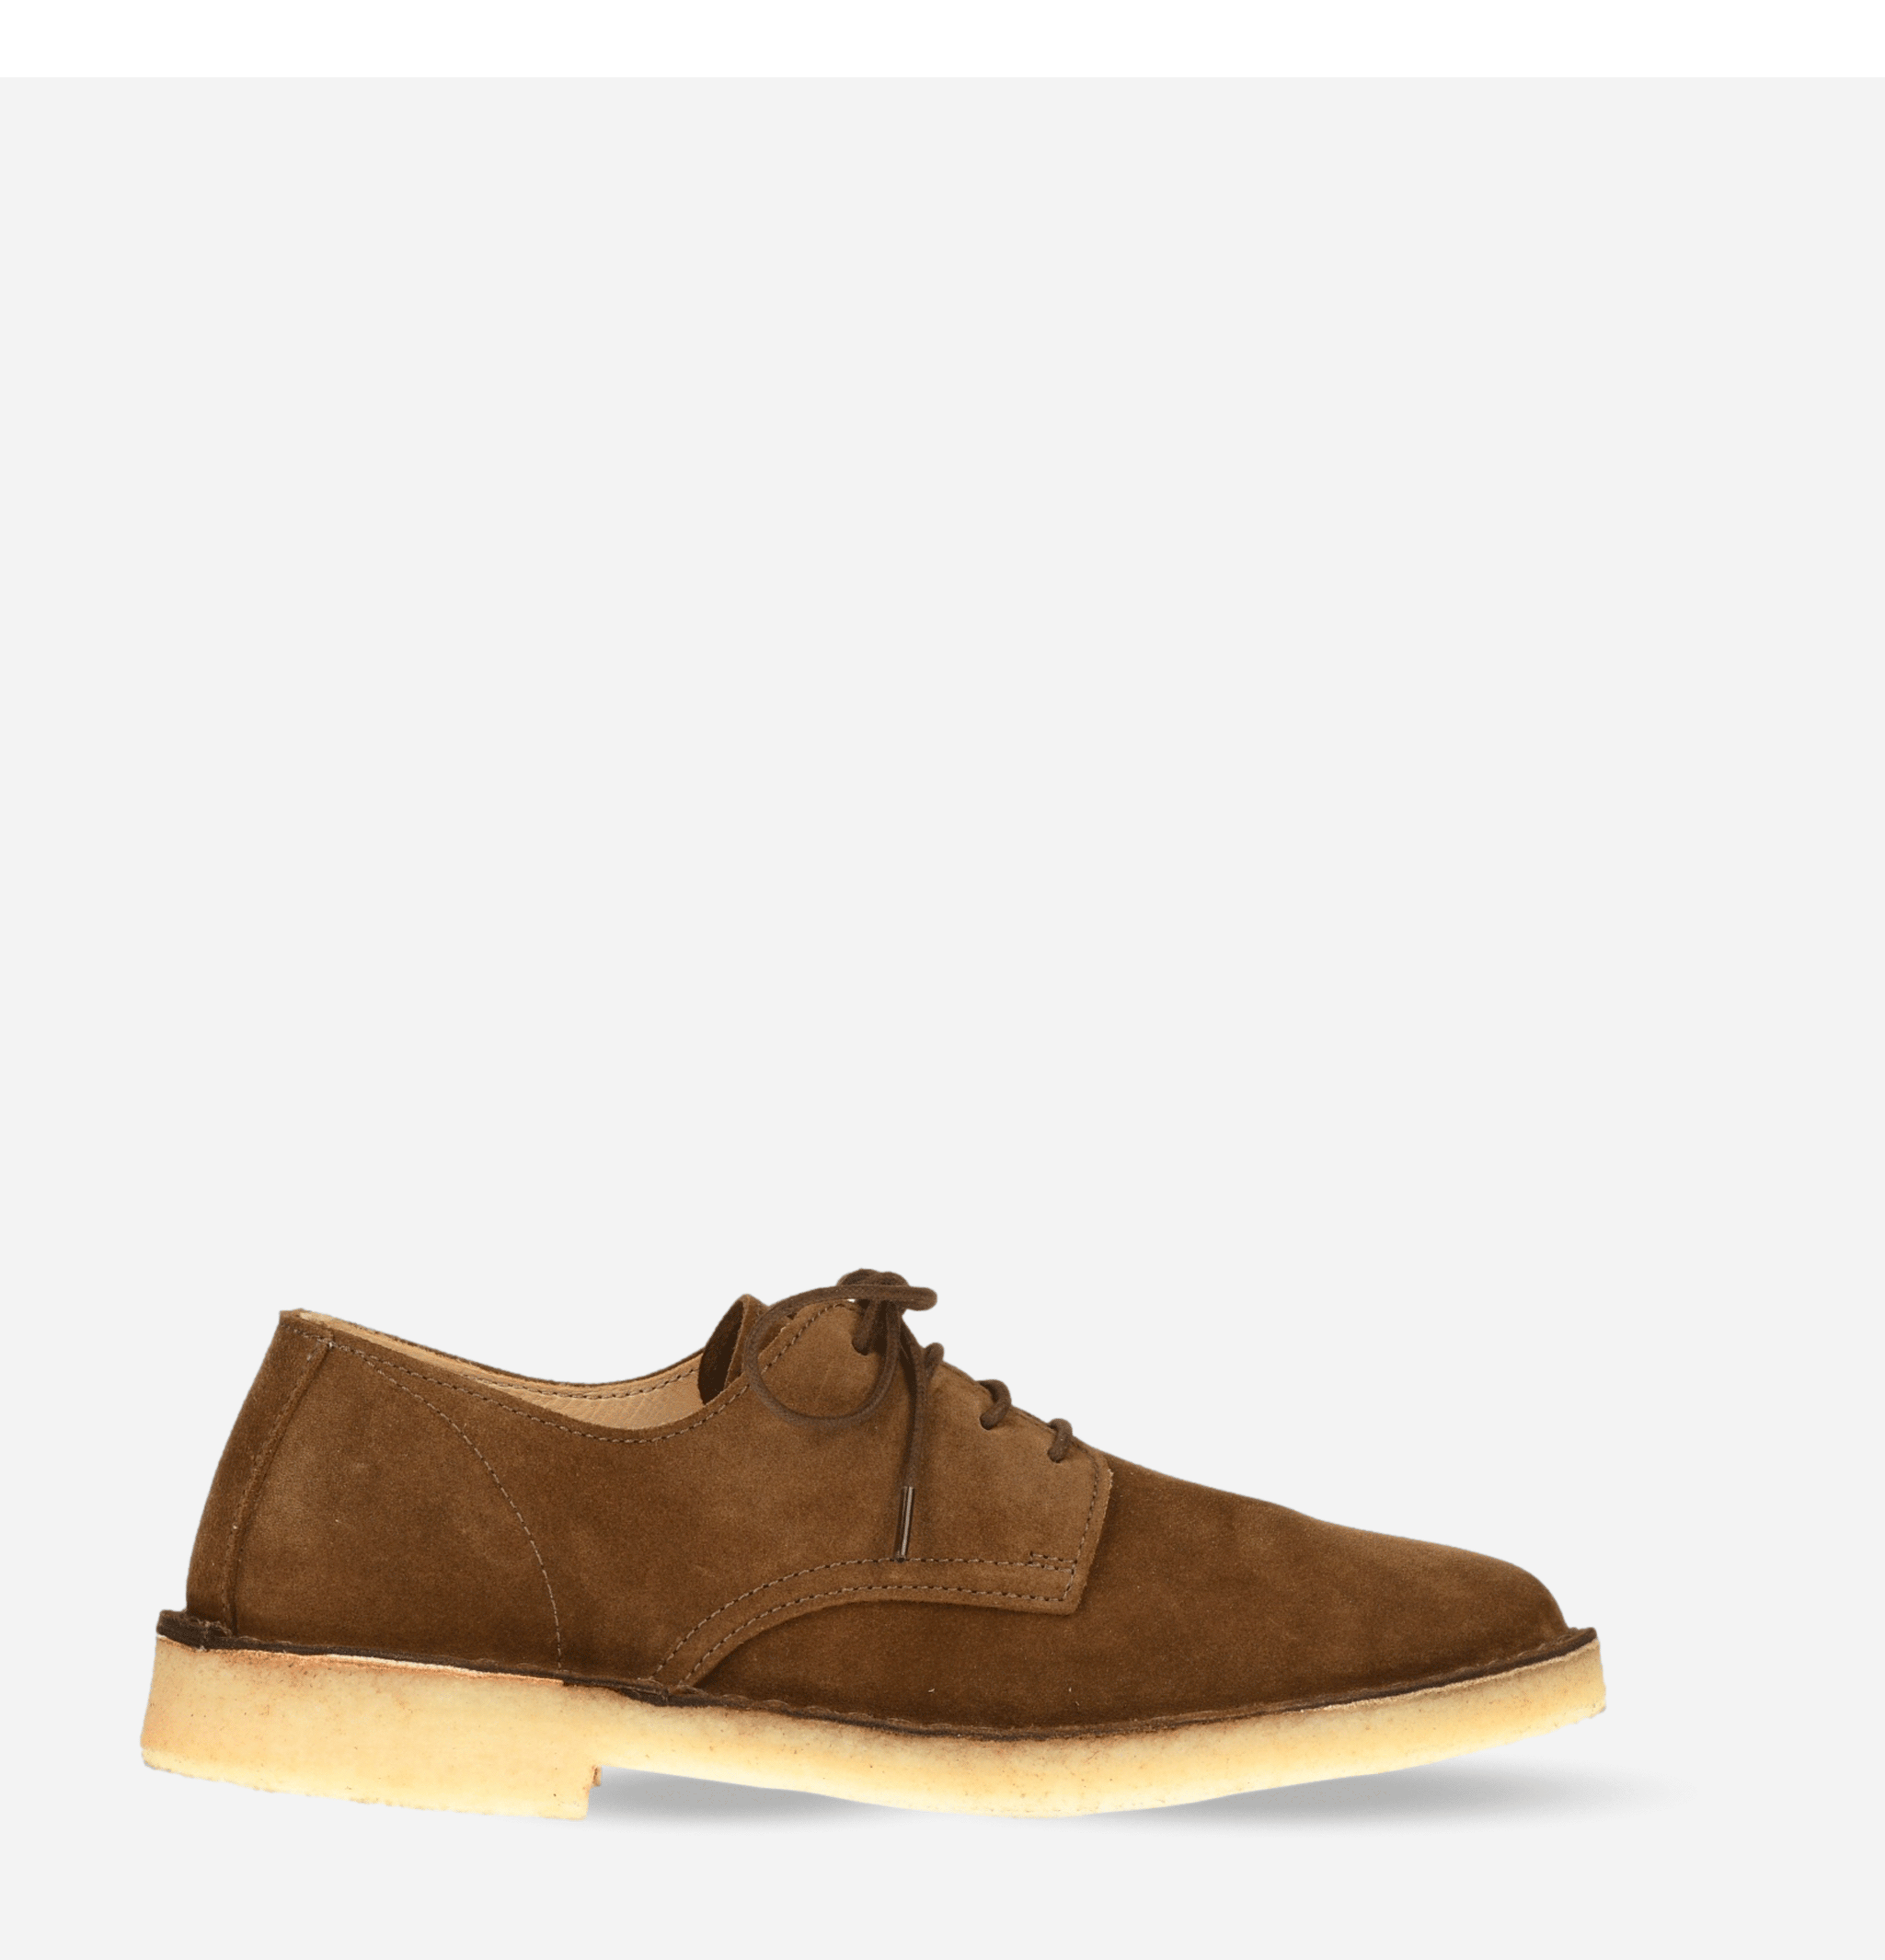 Coastflex Shoes Khaki